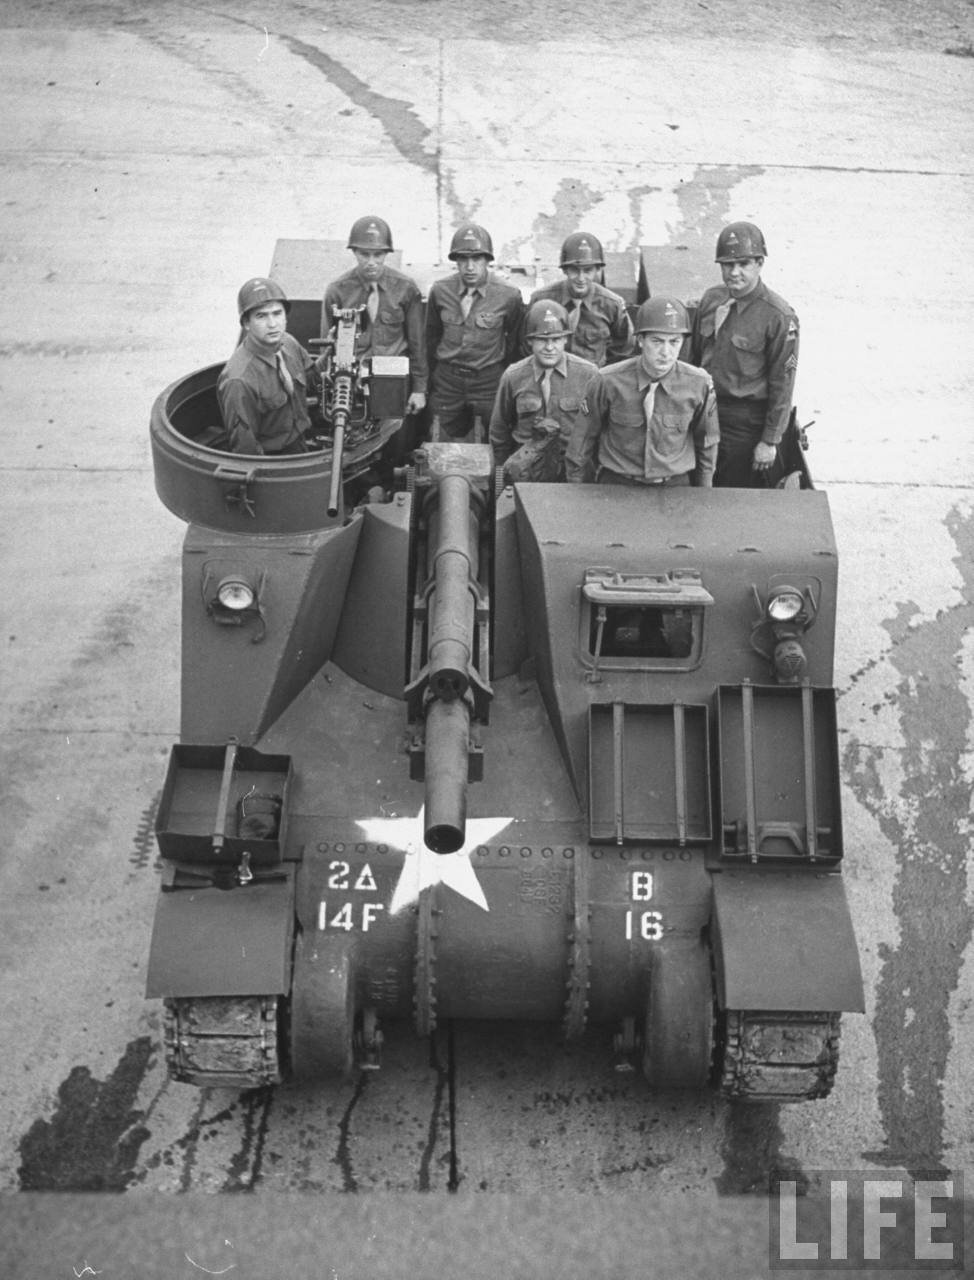 14th Field Artillery M7 Priest crew, 1946.